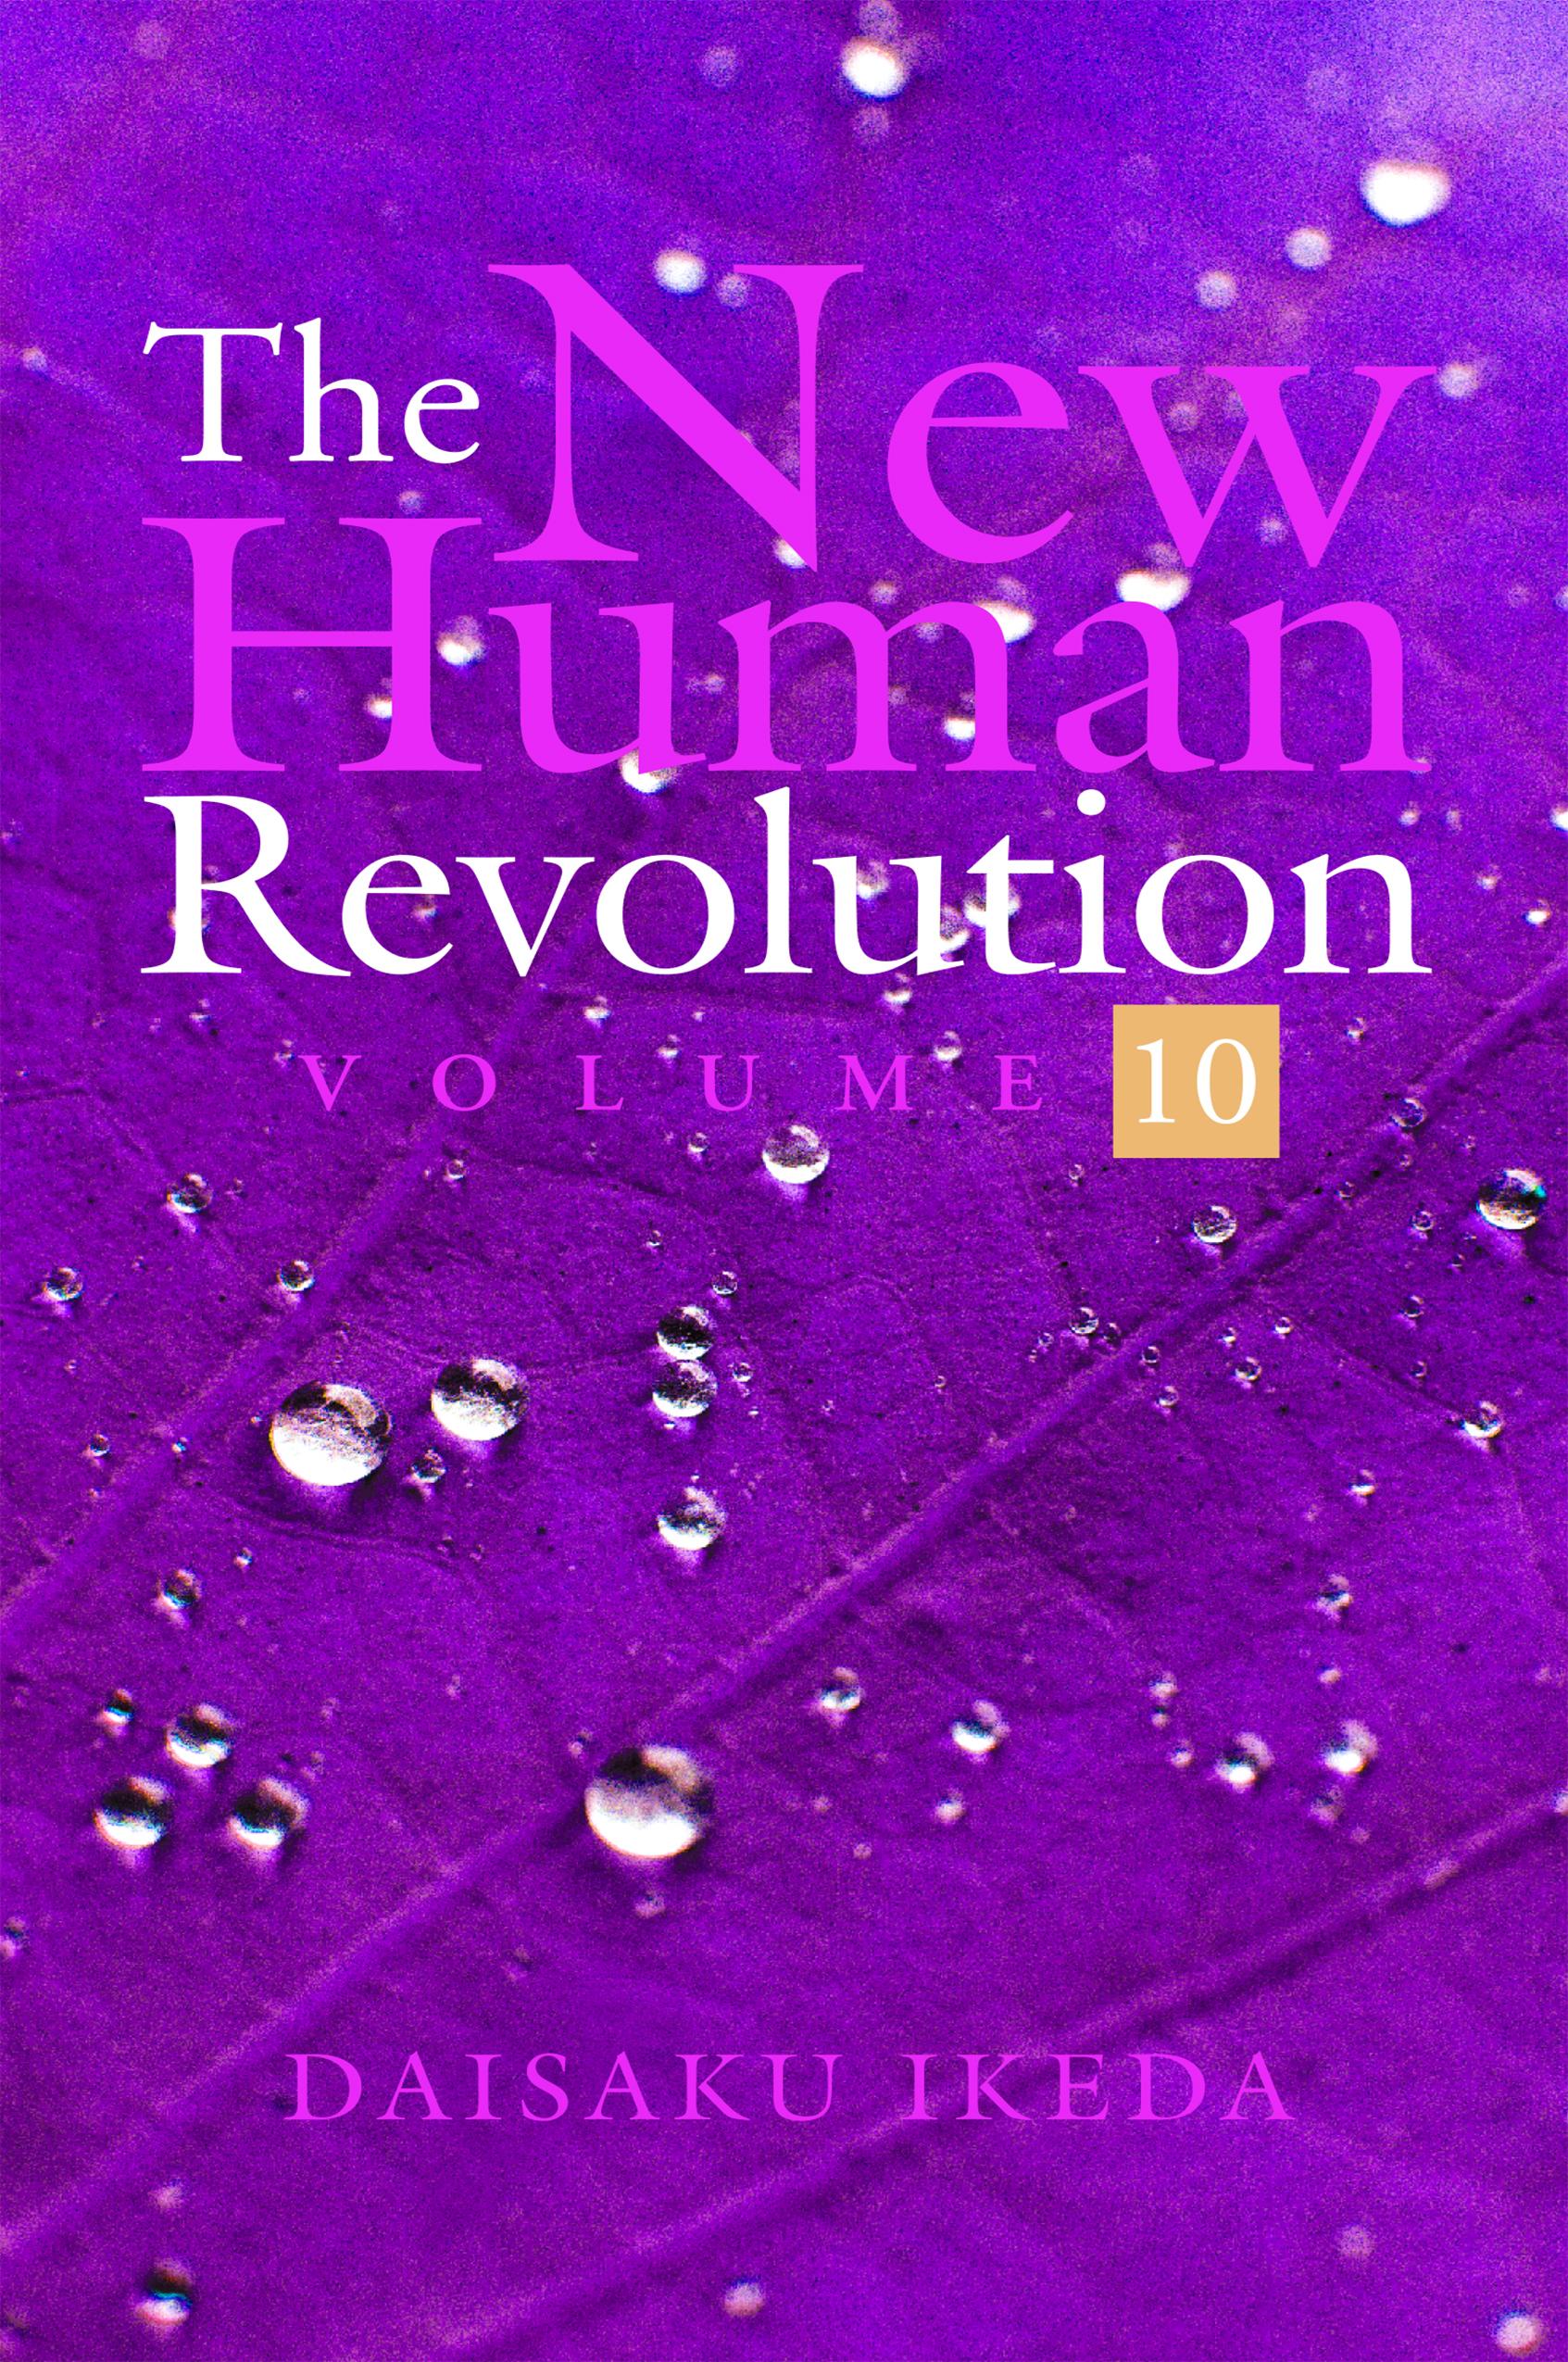 THE NEW HUMAN REVOLUTION VOLUME - 10